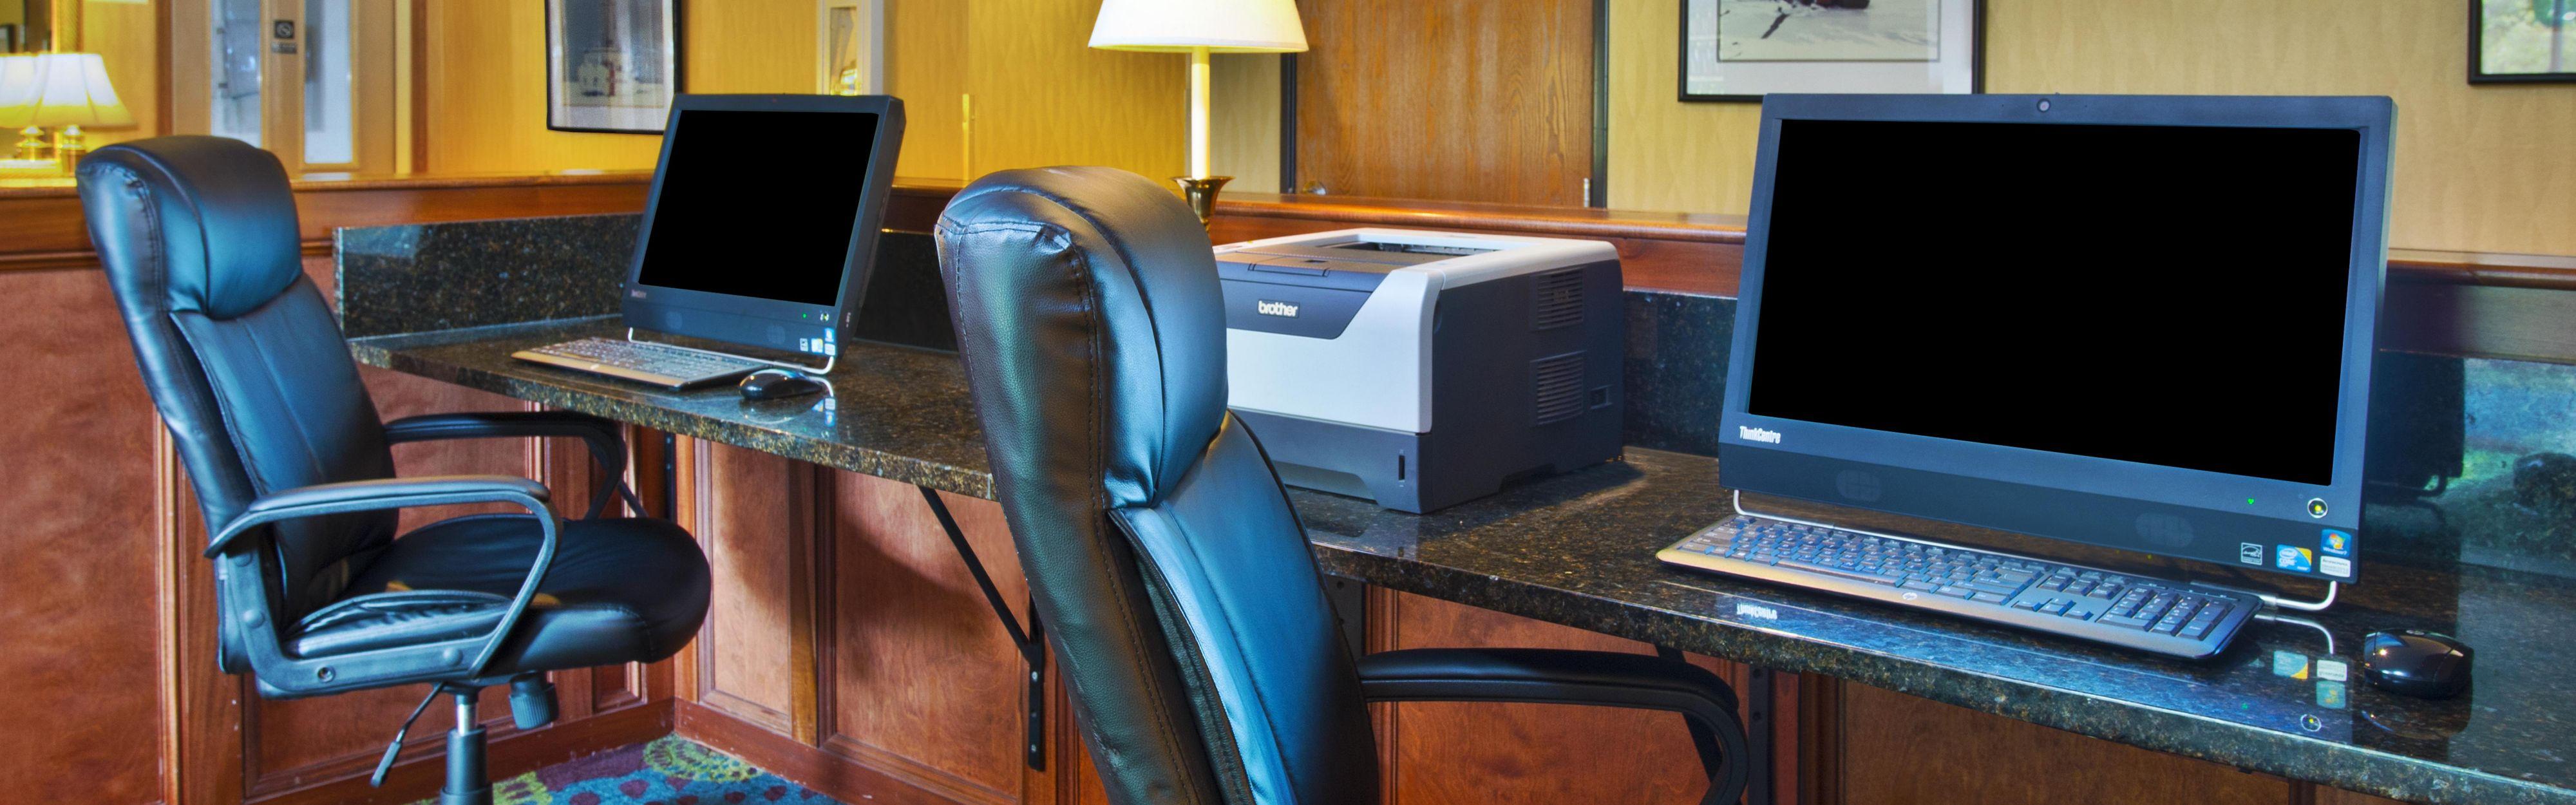 Holiday Inn Express Mackinaw City image 2